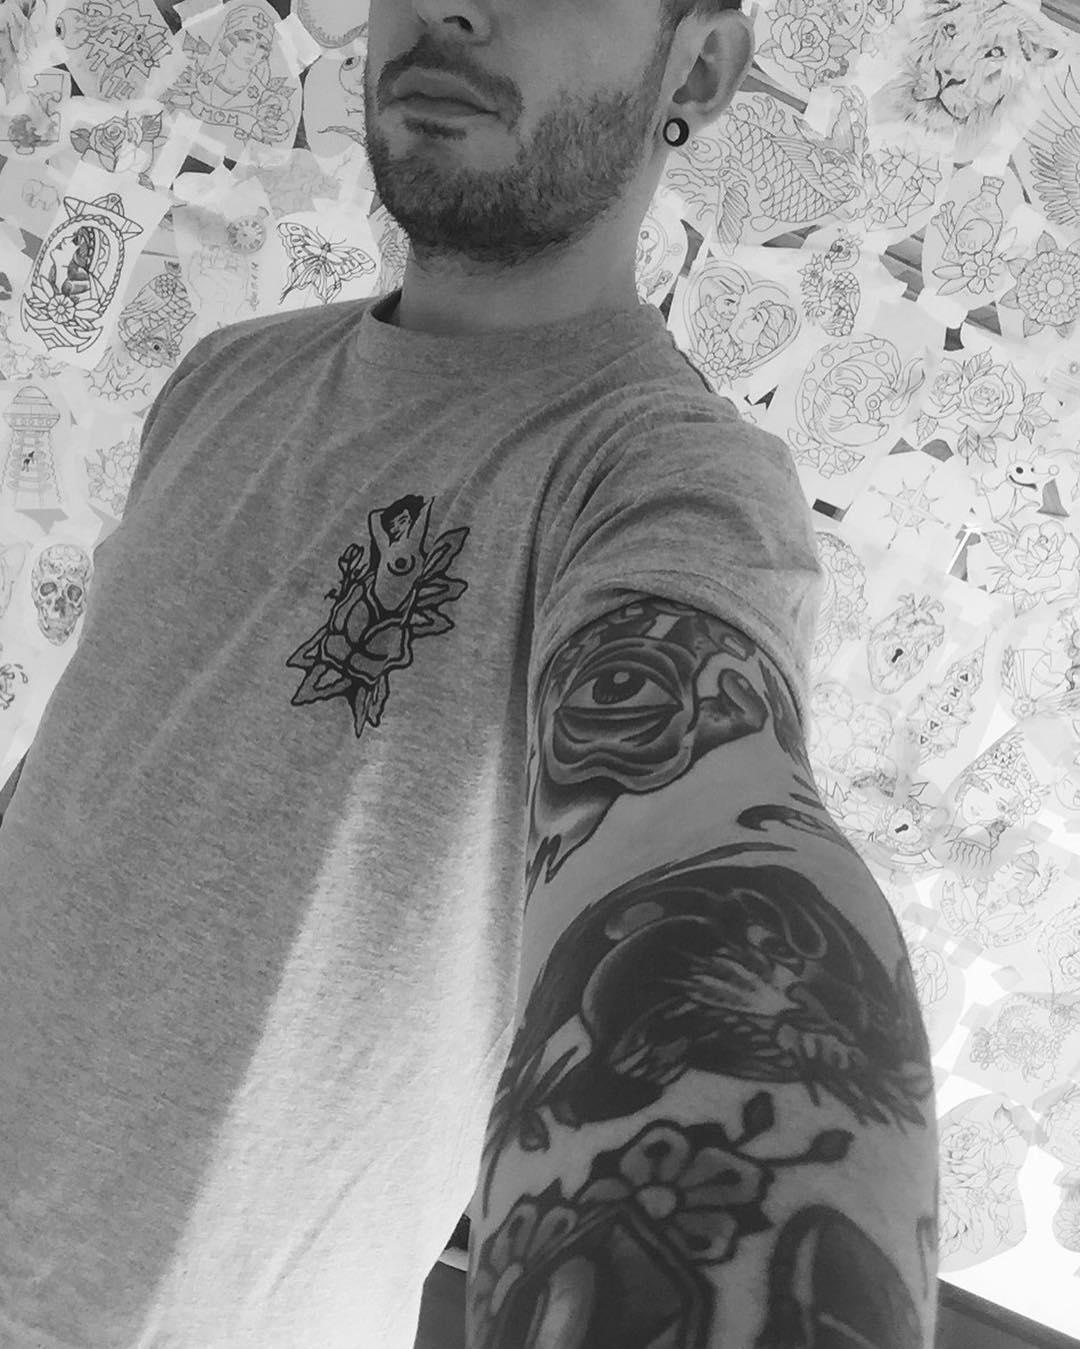 tattooart,art,artistic,old,oldschollshit,custommade,owl,tabasco,berlintattoo,barcelonatattoo,ibizatattoo,tabascotattooer,bestattooers,tradicionaltattooers,bestisbest,tatuajes,berlintattooers,ontheroad,classictattoo,tendencia,creativity,bobinas,tradicional,studyofberlin,berlincity,tatuandoenberlin,tattooersberlin671346146,tattoo,tattoos,tattooart,art,artistic,old,oldschollshit,custommade,owl,tabasco,berlintattoo,barcelonatattoo,ibizatattoo,tabascotattooer